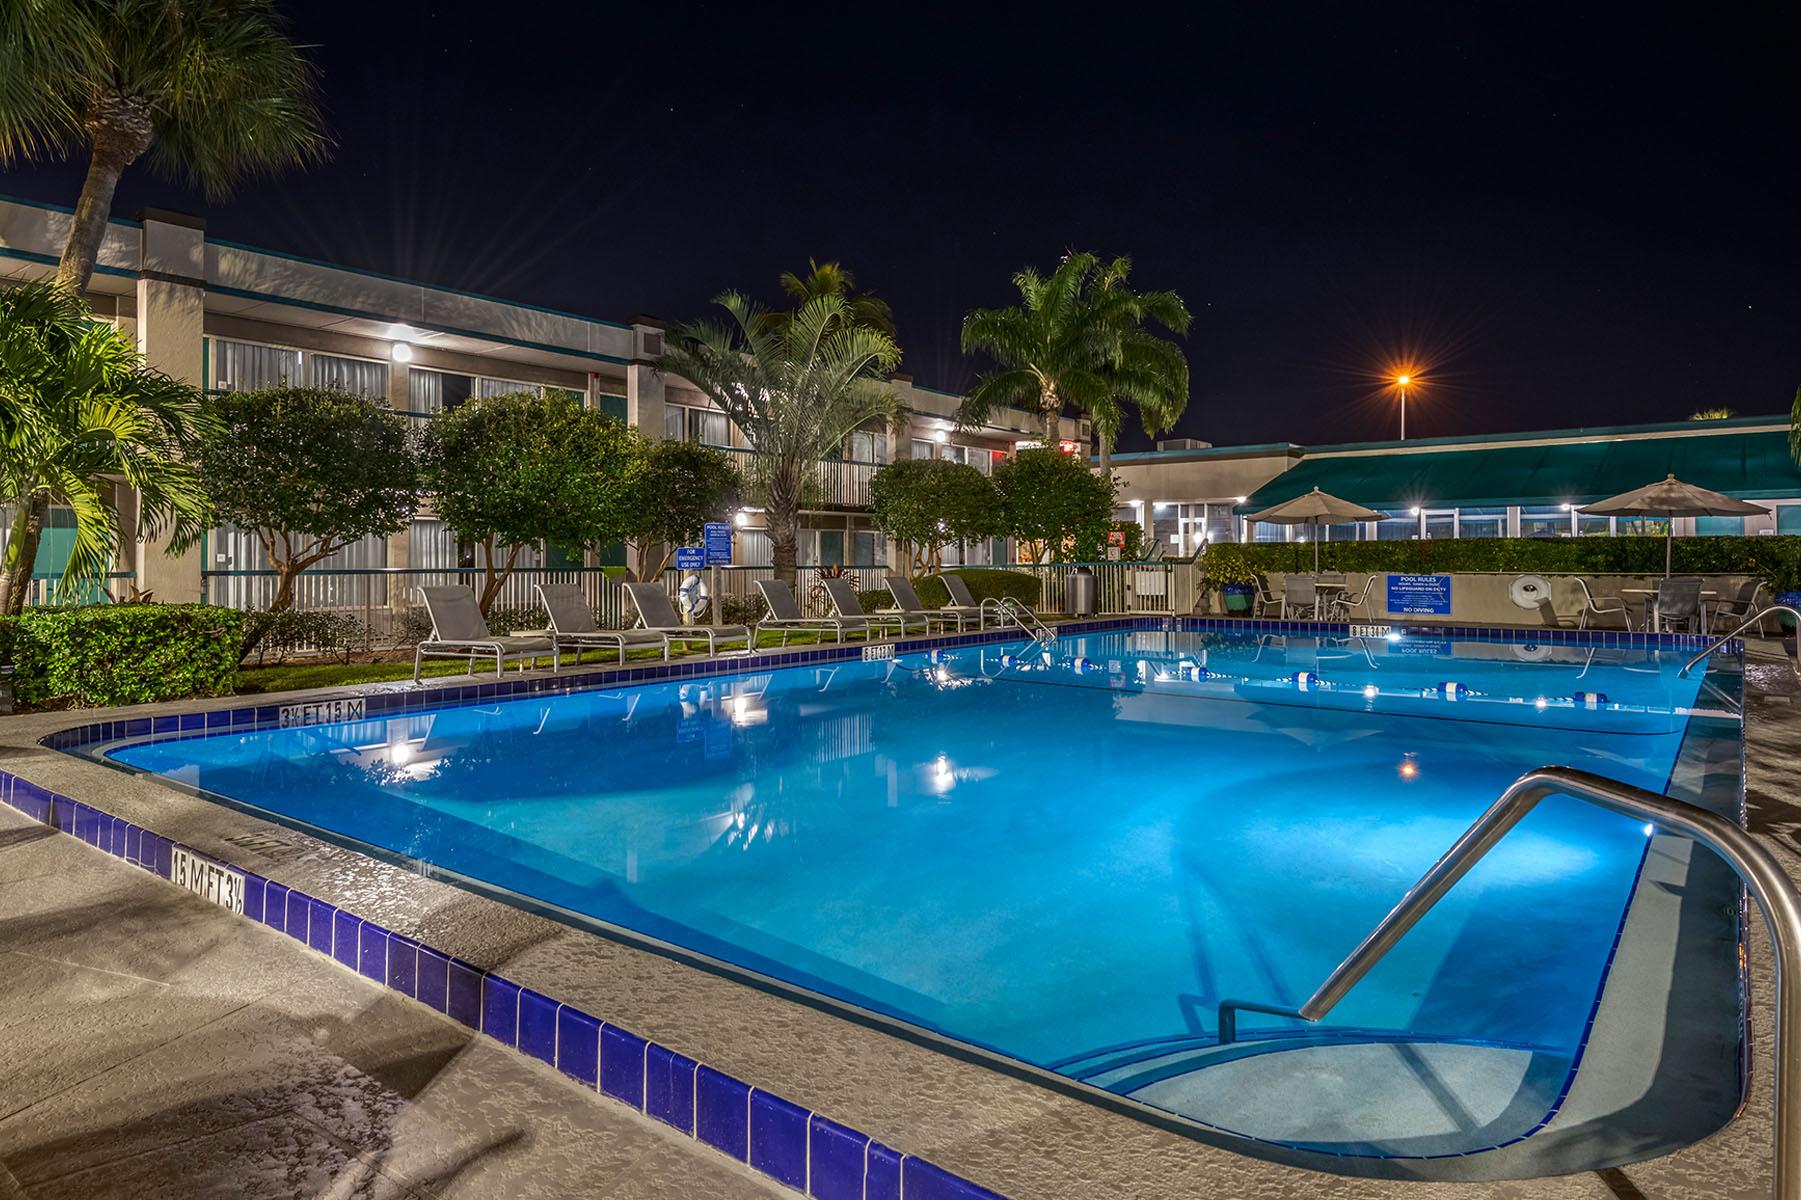 best western stuart pool night